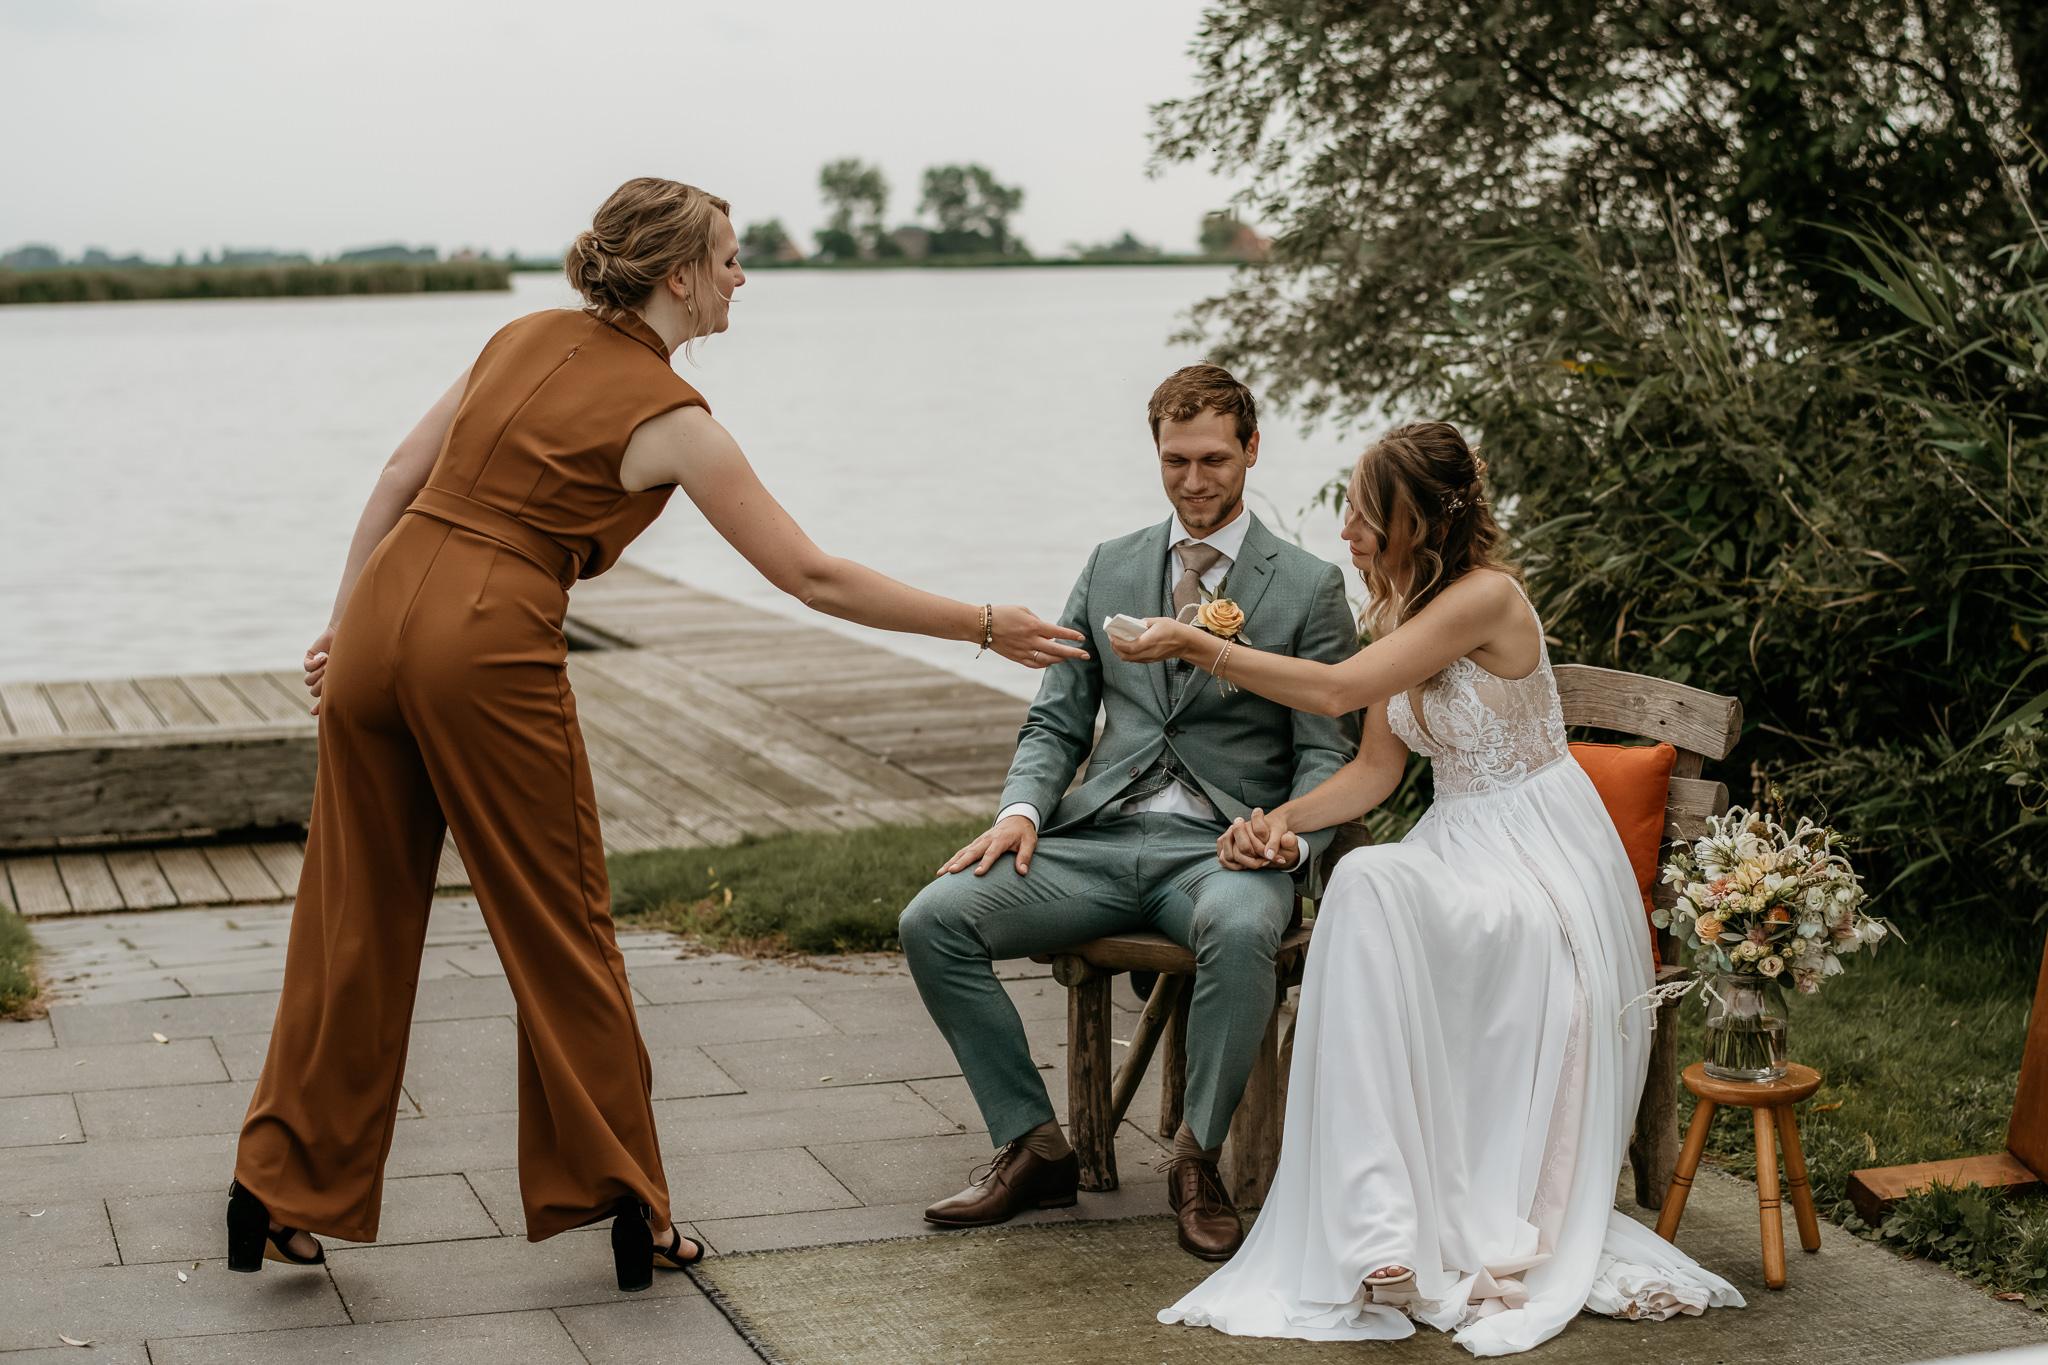 Trouwfotograaf Friesland Pollepleats